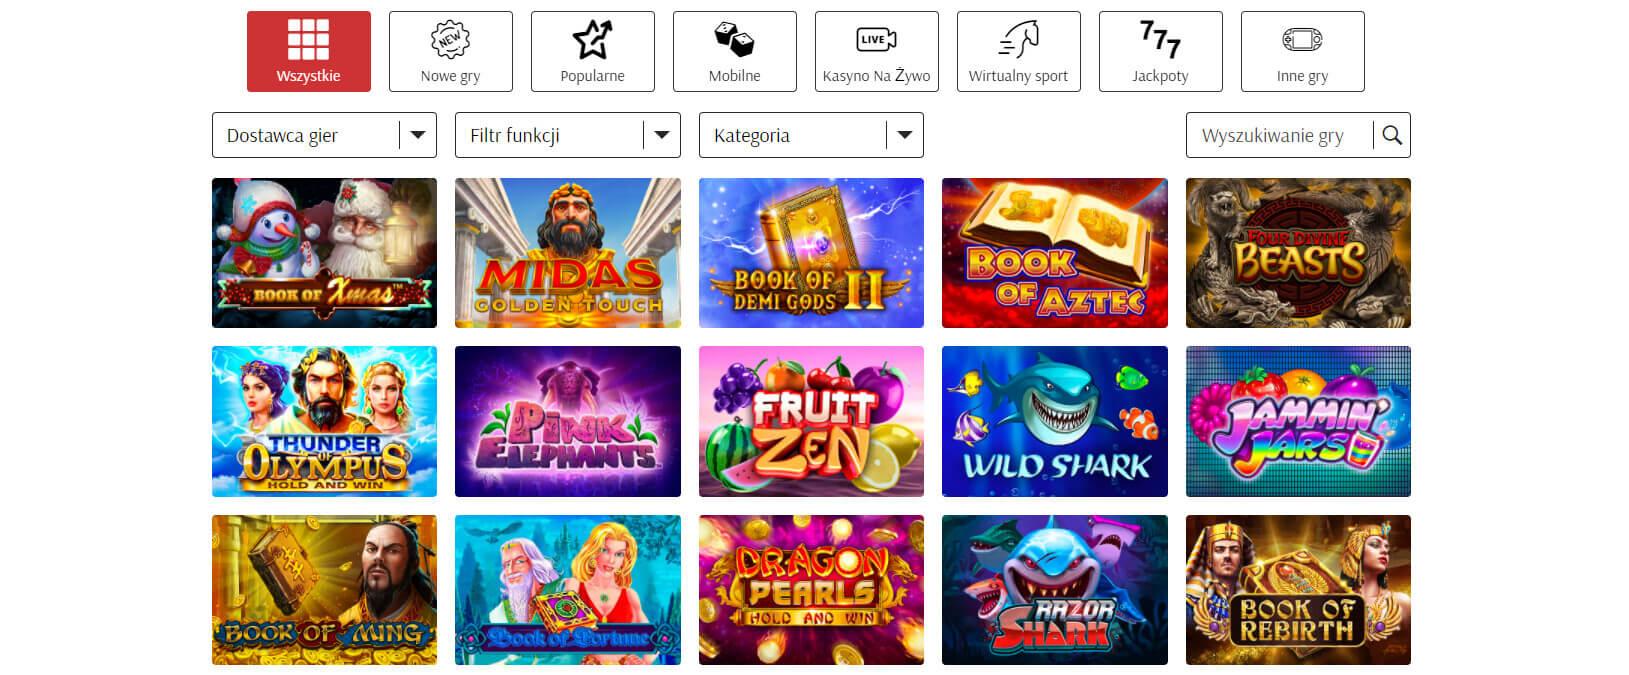 supercat oferta gier hazardowych screenshot